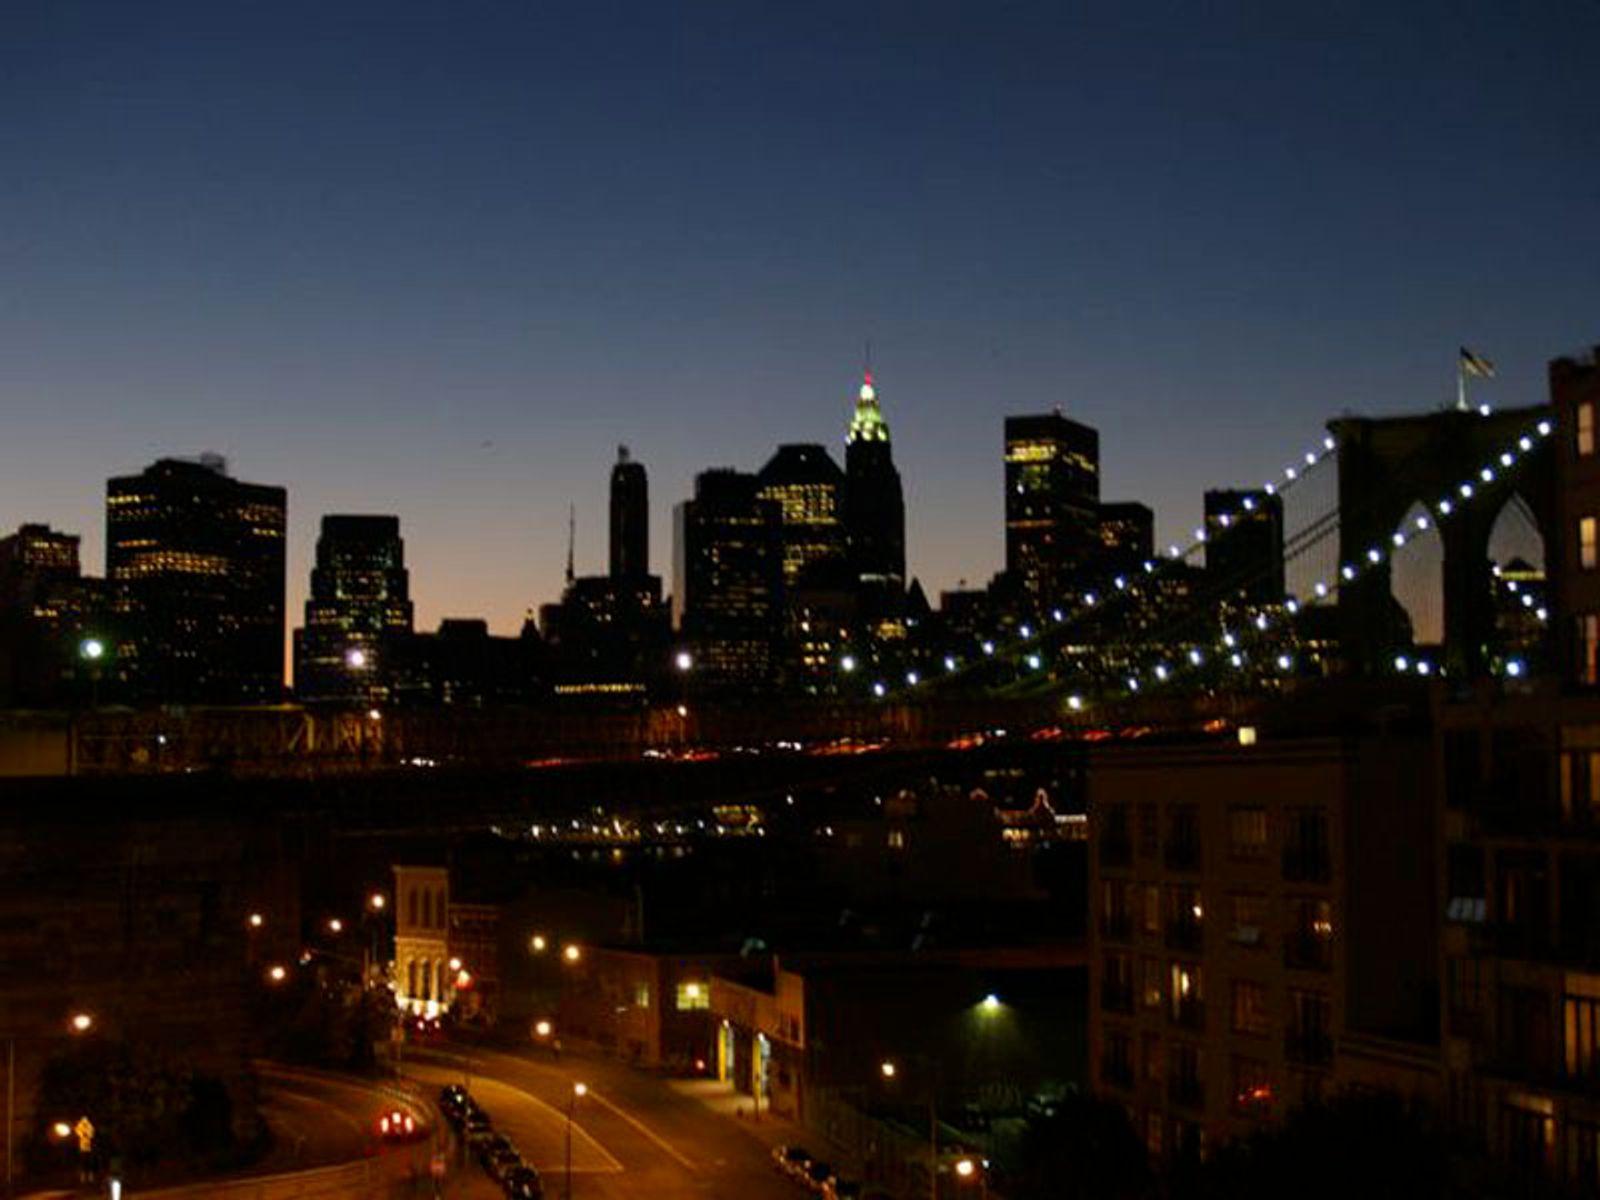 Sensational Sunset & Bridge Views